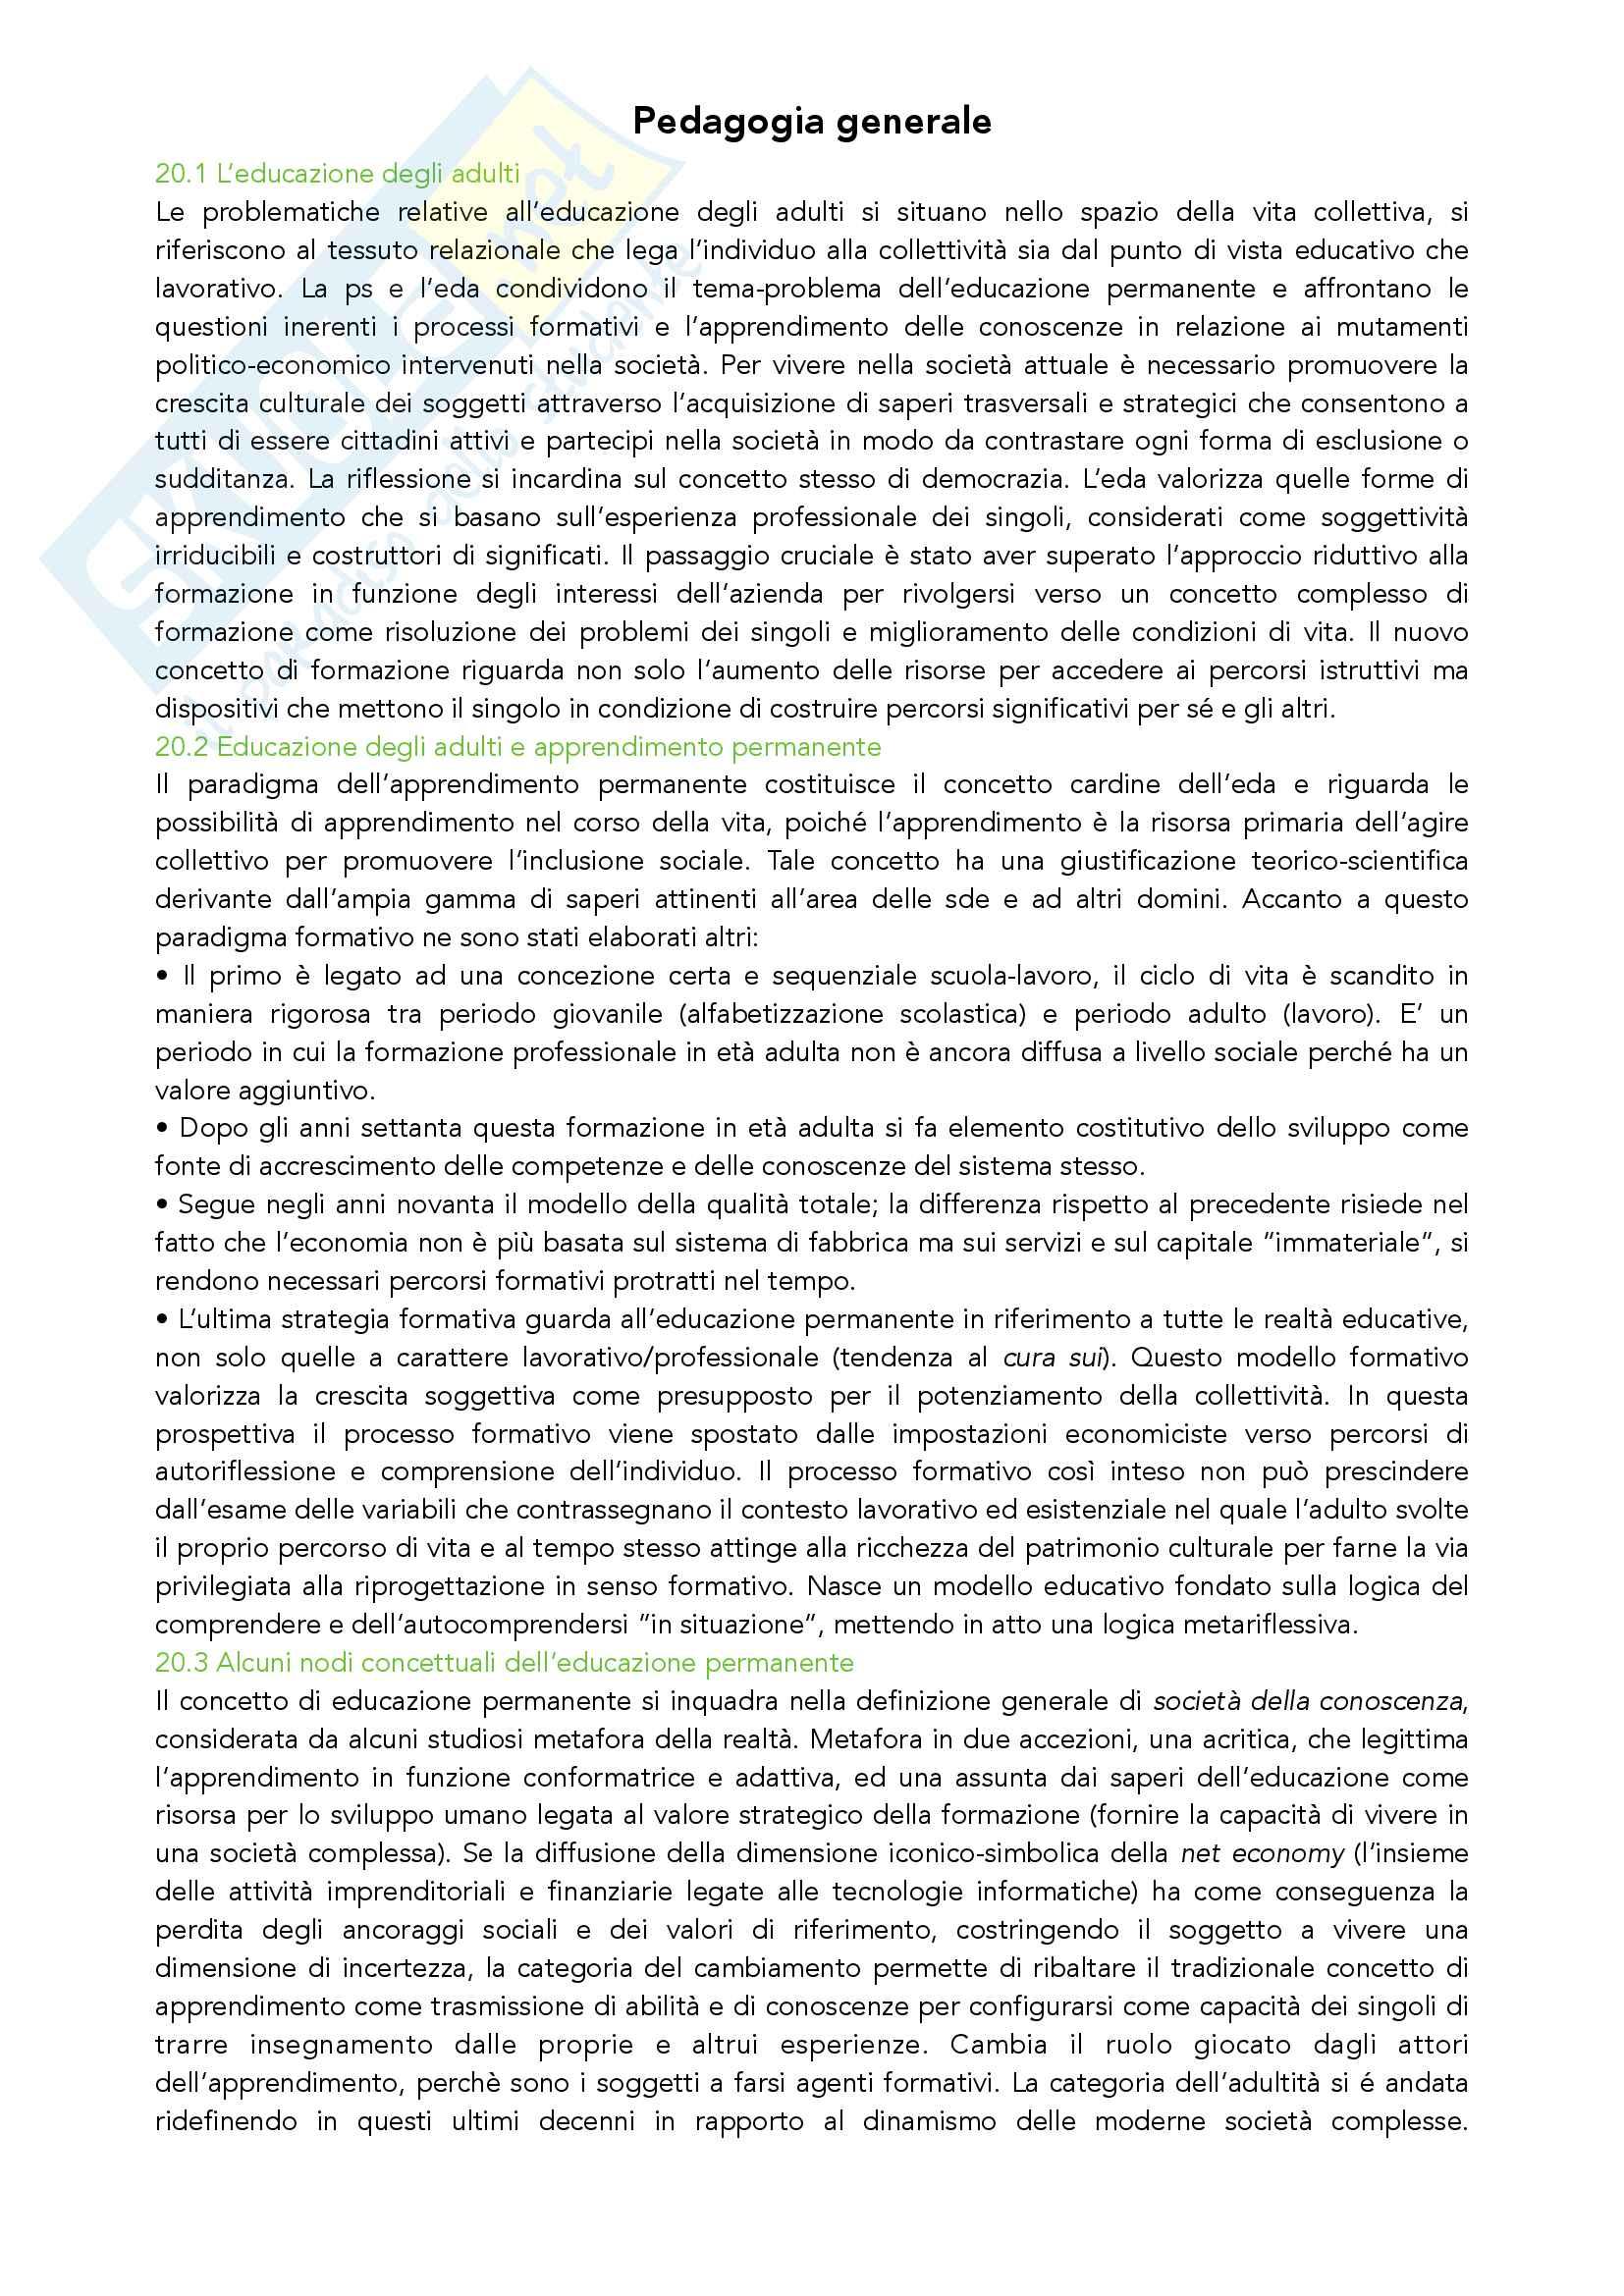 Riassunto esame Pedagogia Generale, prof. Madrussan, libro consigliato Pedagogia Generale, Cambi Pag. 6